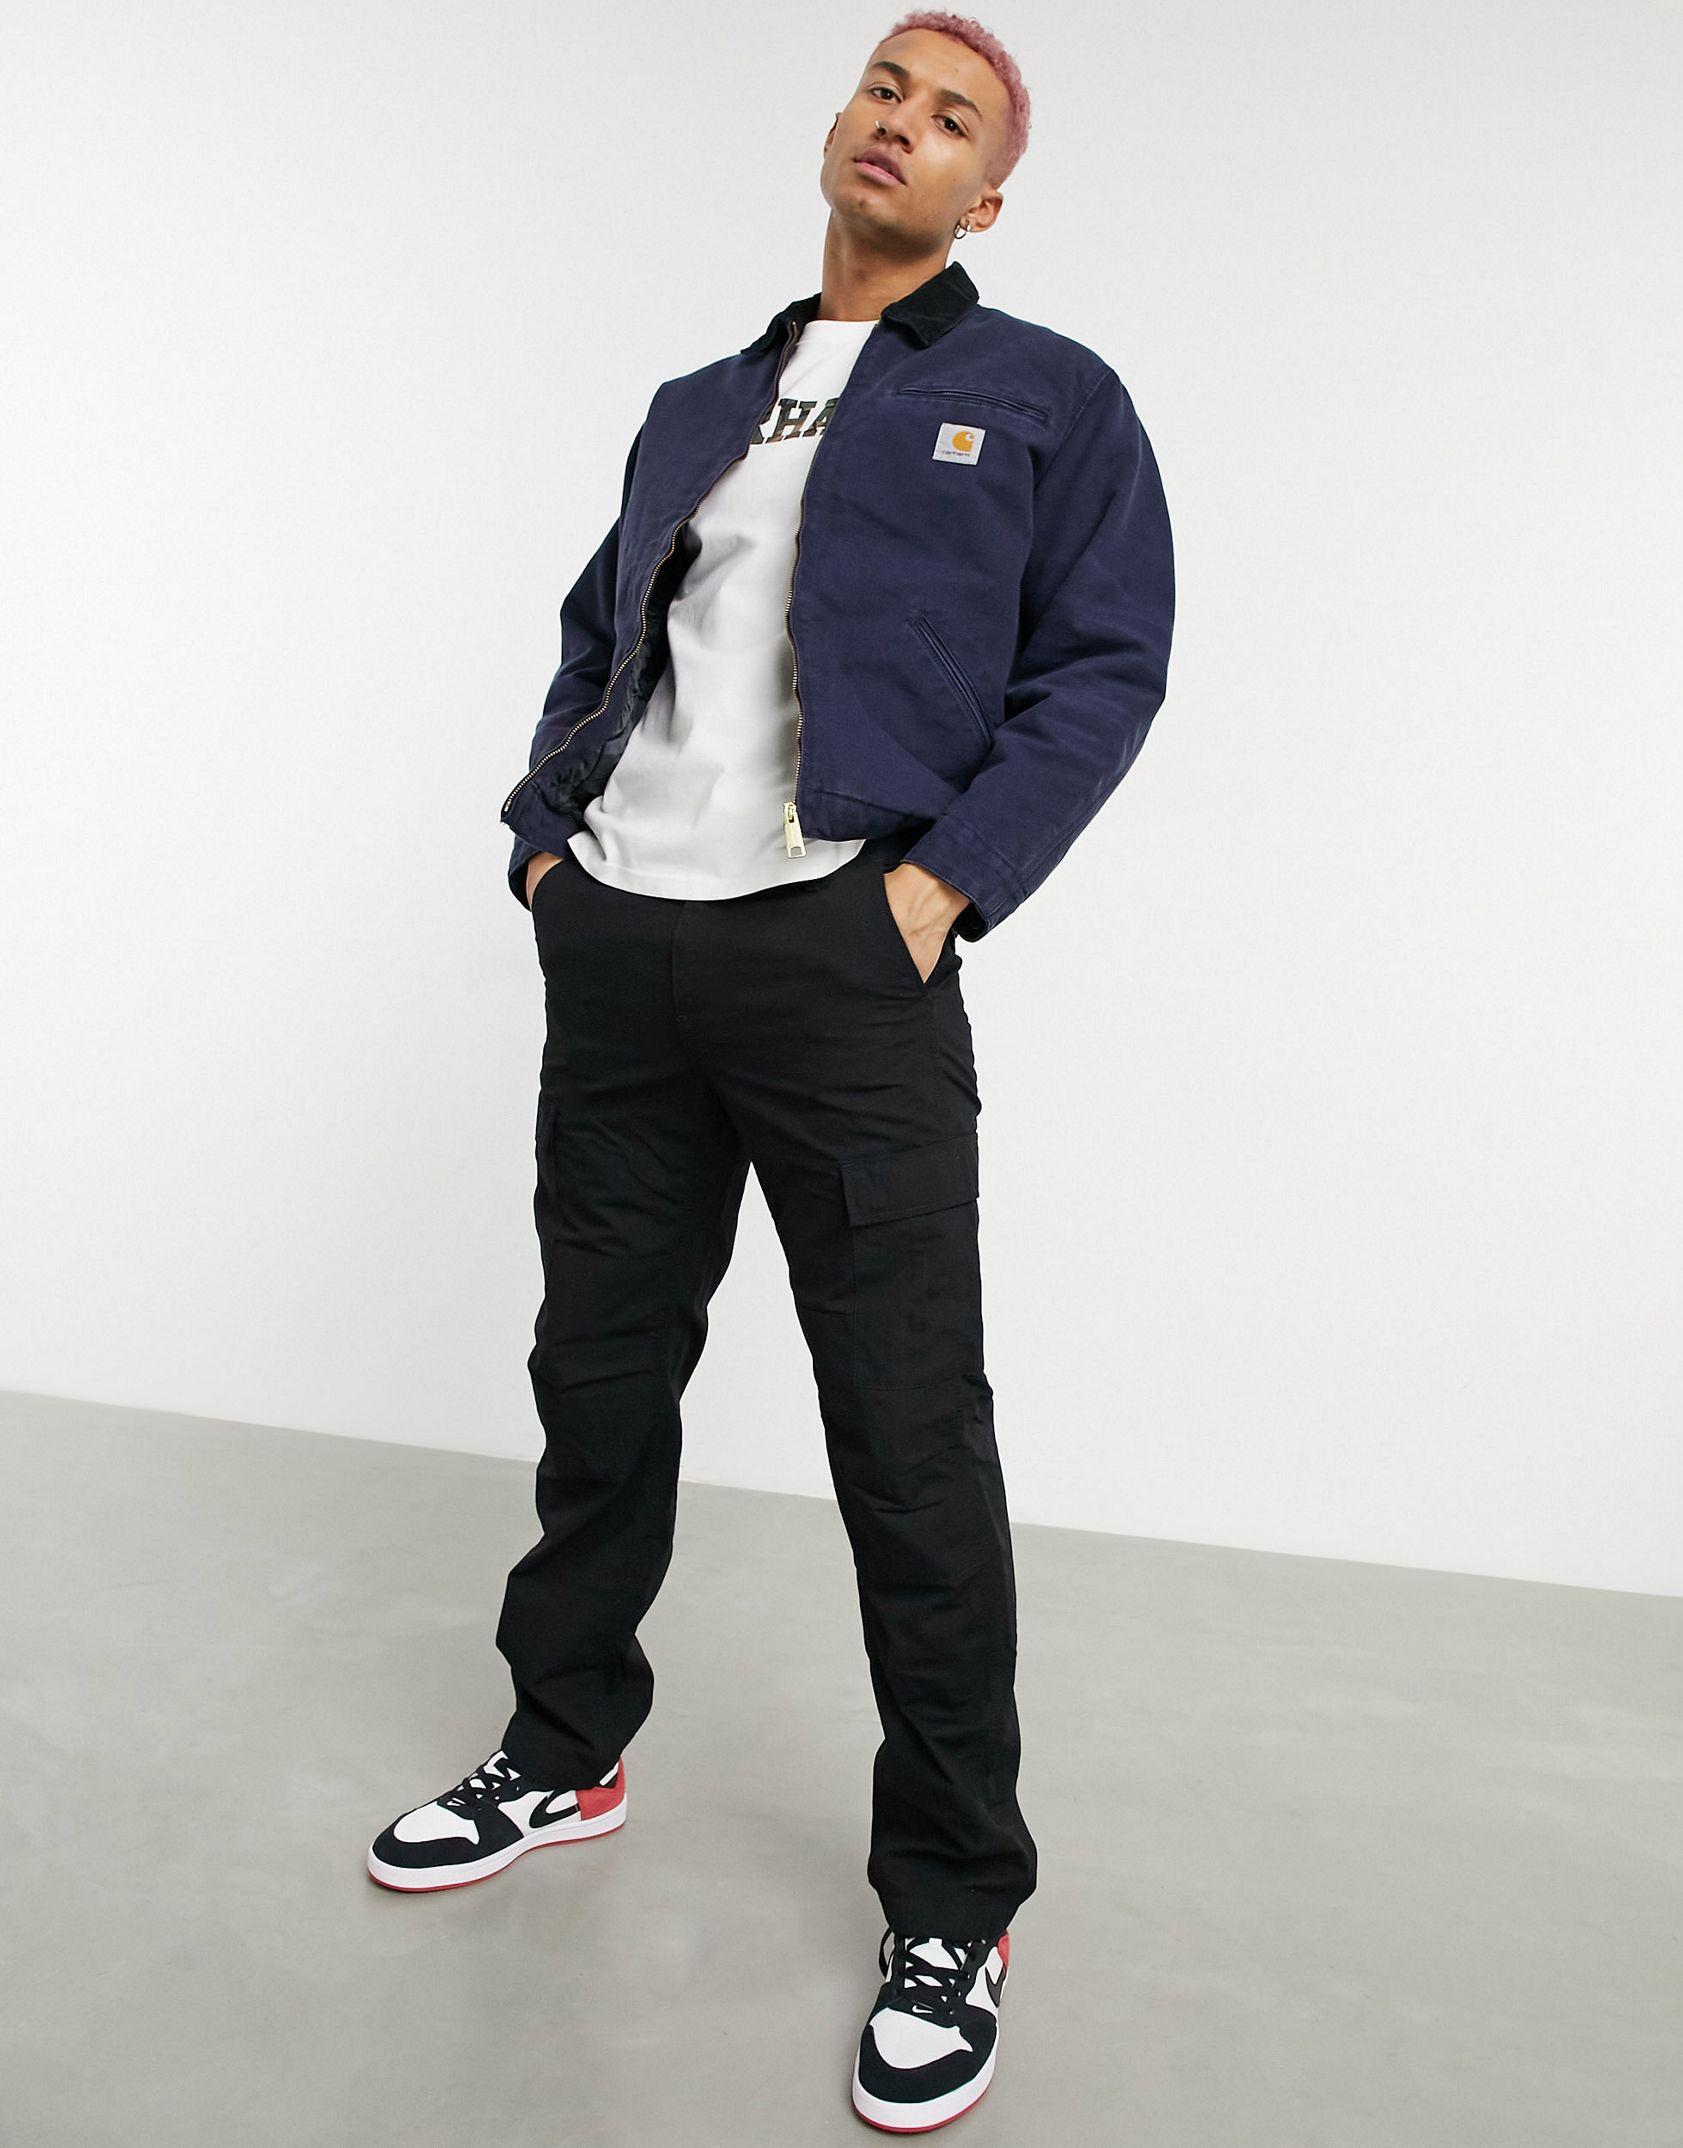 Carhartt WIP OG detroit lined jacket in navy -  Price Checker